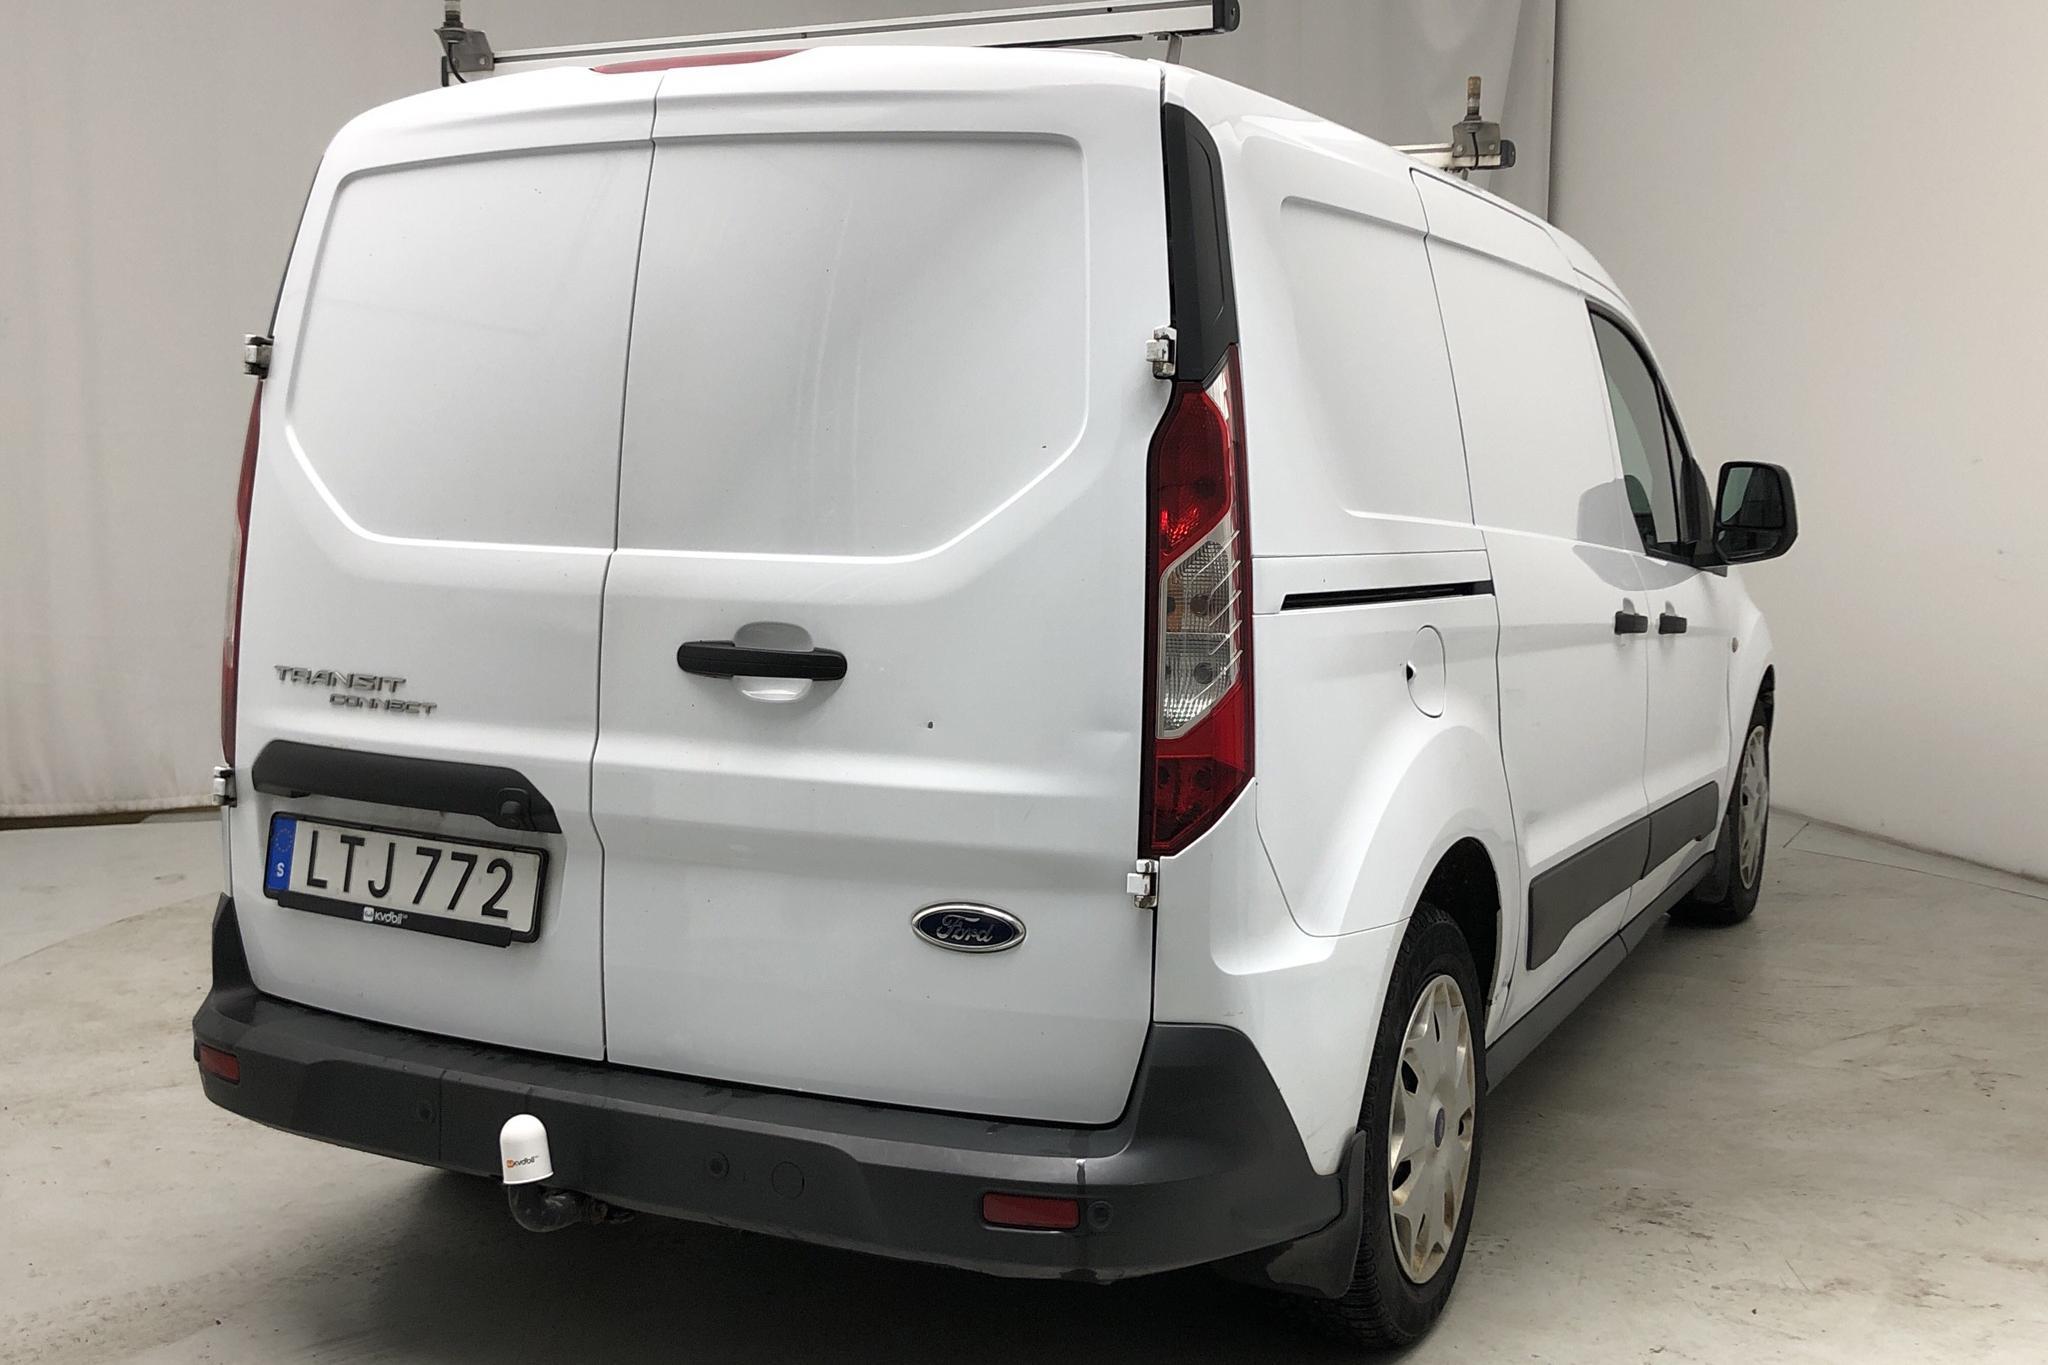 Ford Transit Connect 1.6 TDCi (95hk) - 114 800 km - Manual - white - 2015